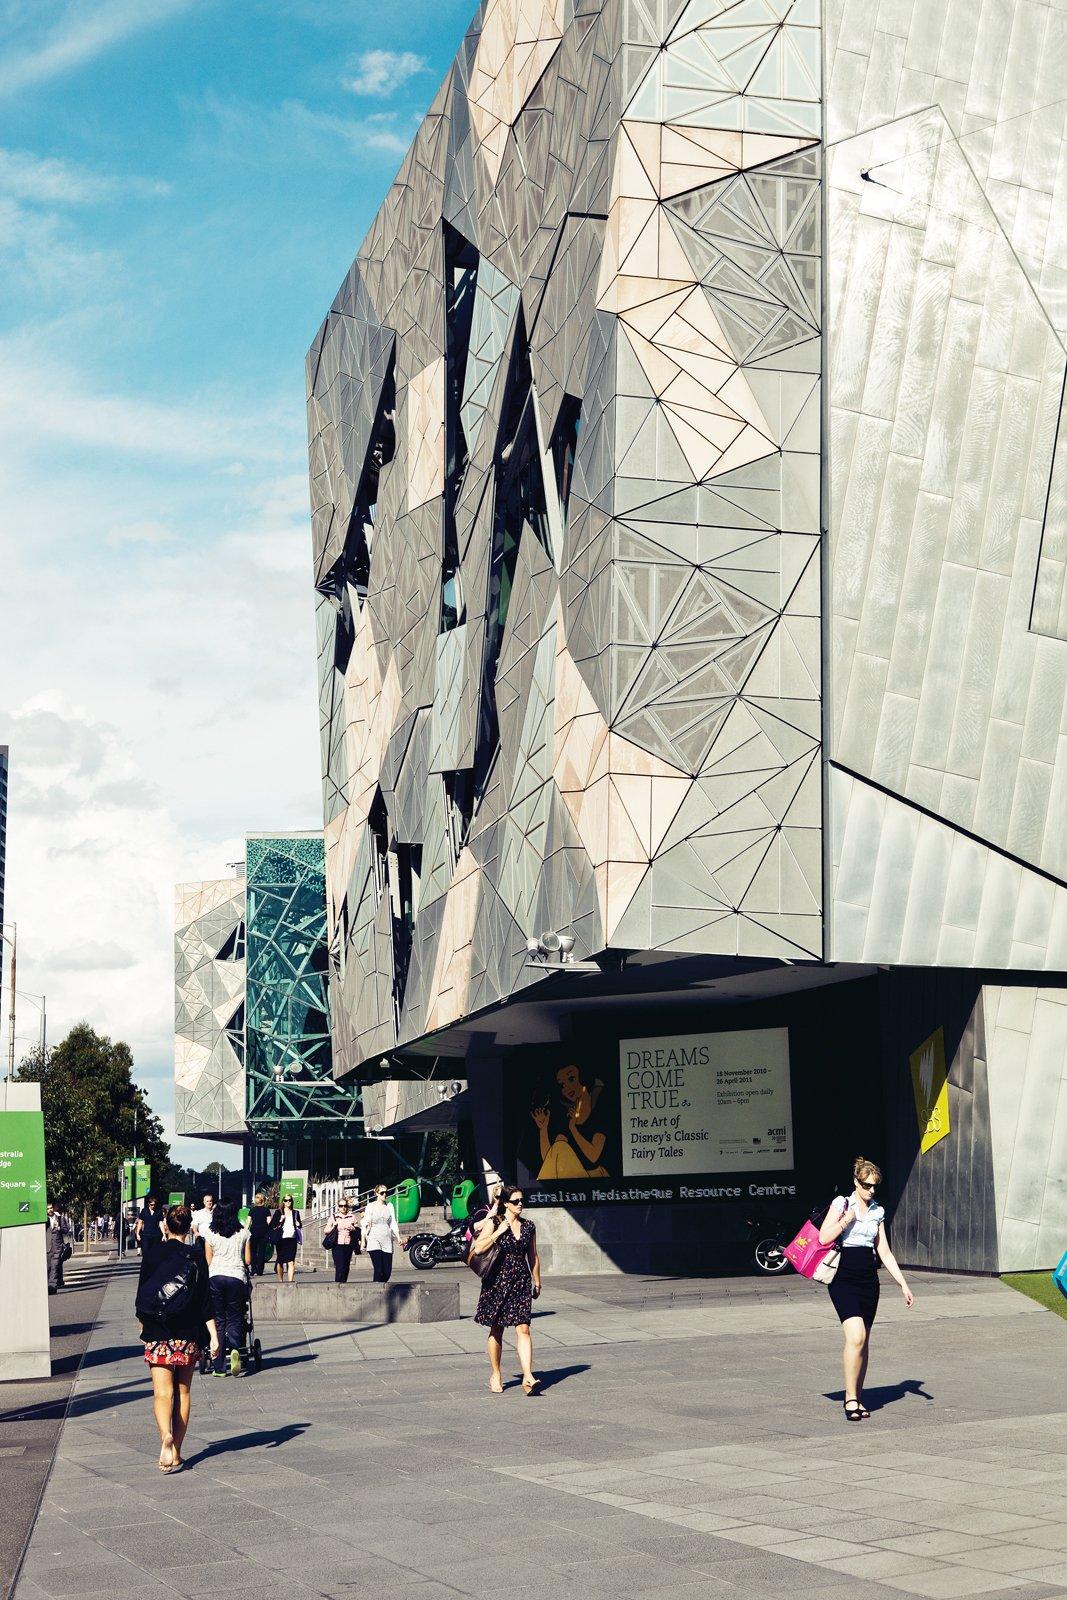 Federation Square  Photo 8 of 24 in Exploring Melbourne, Australia